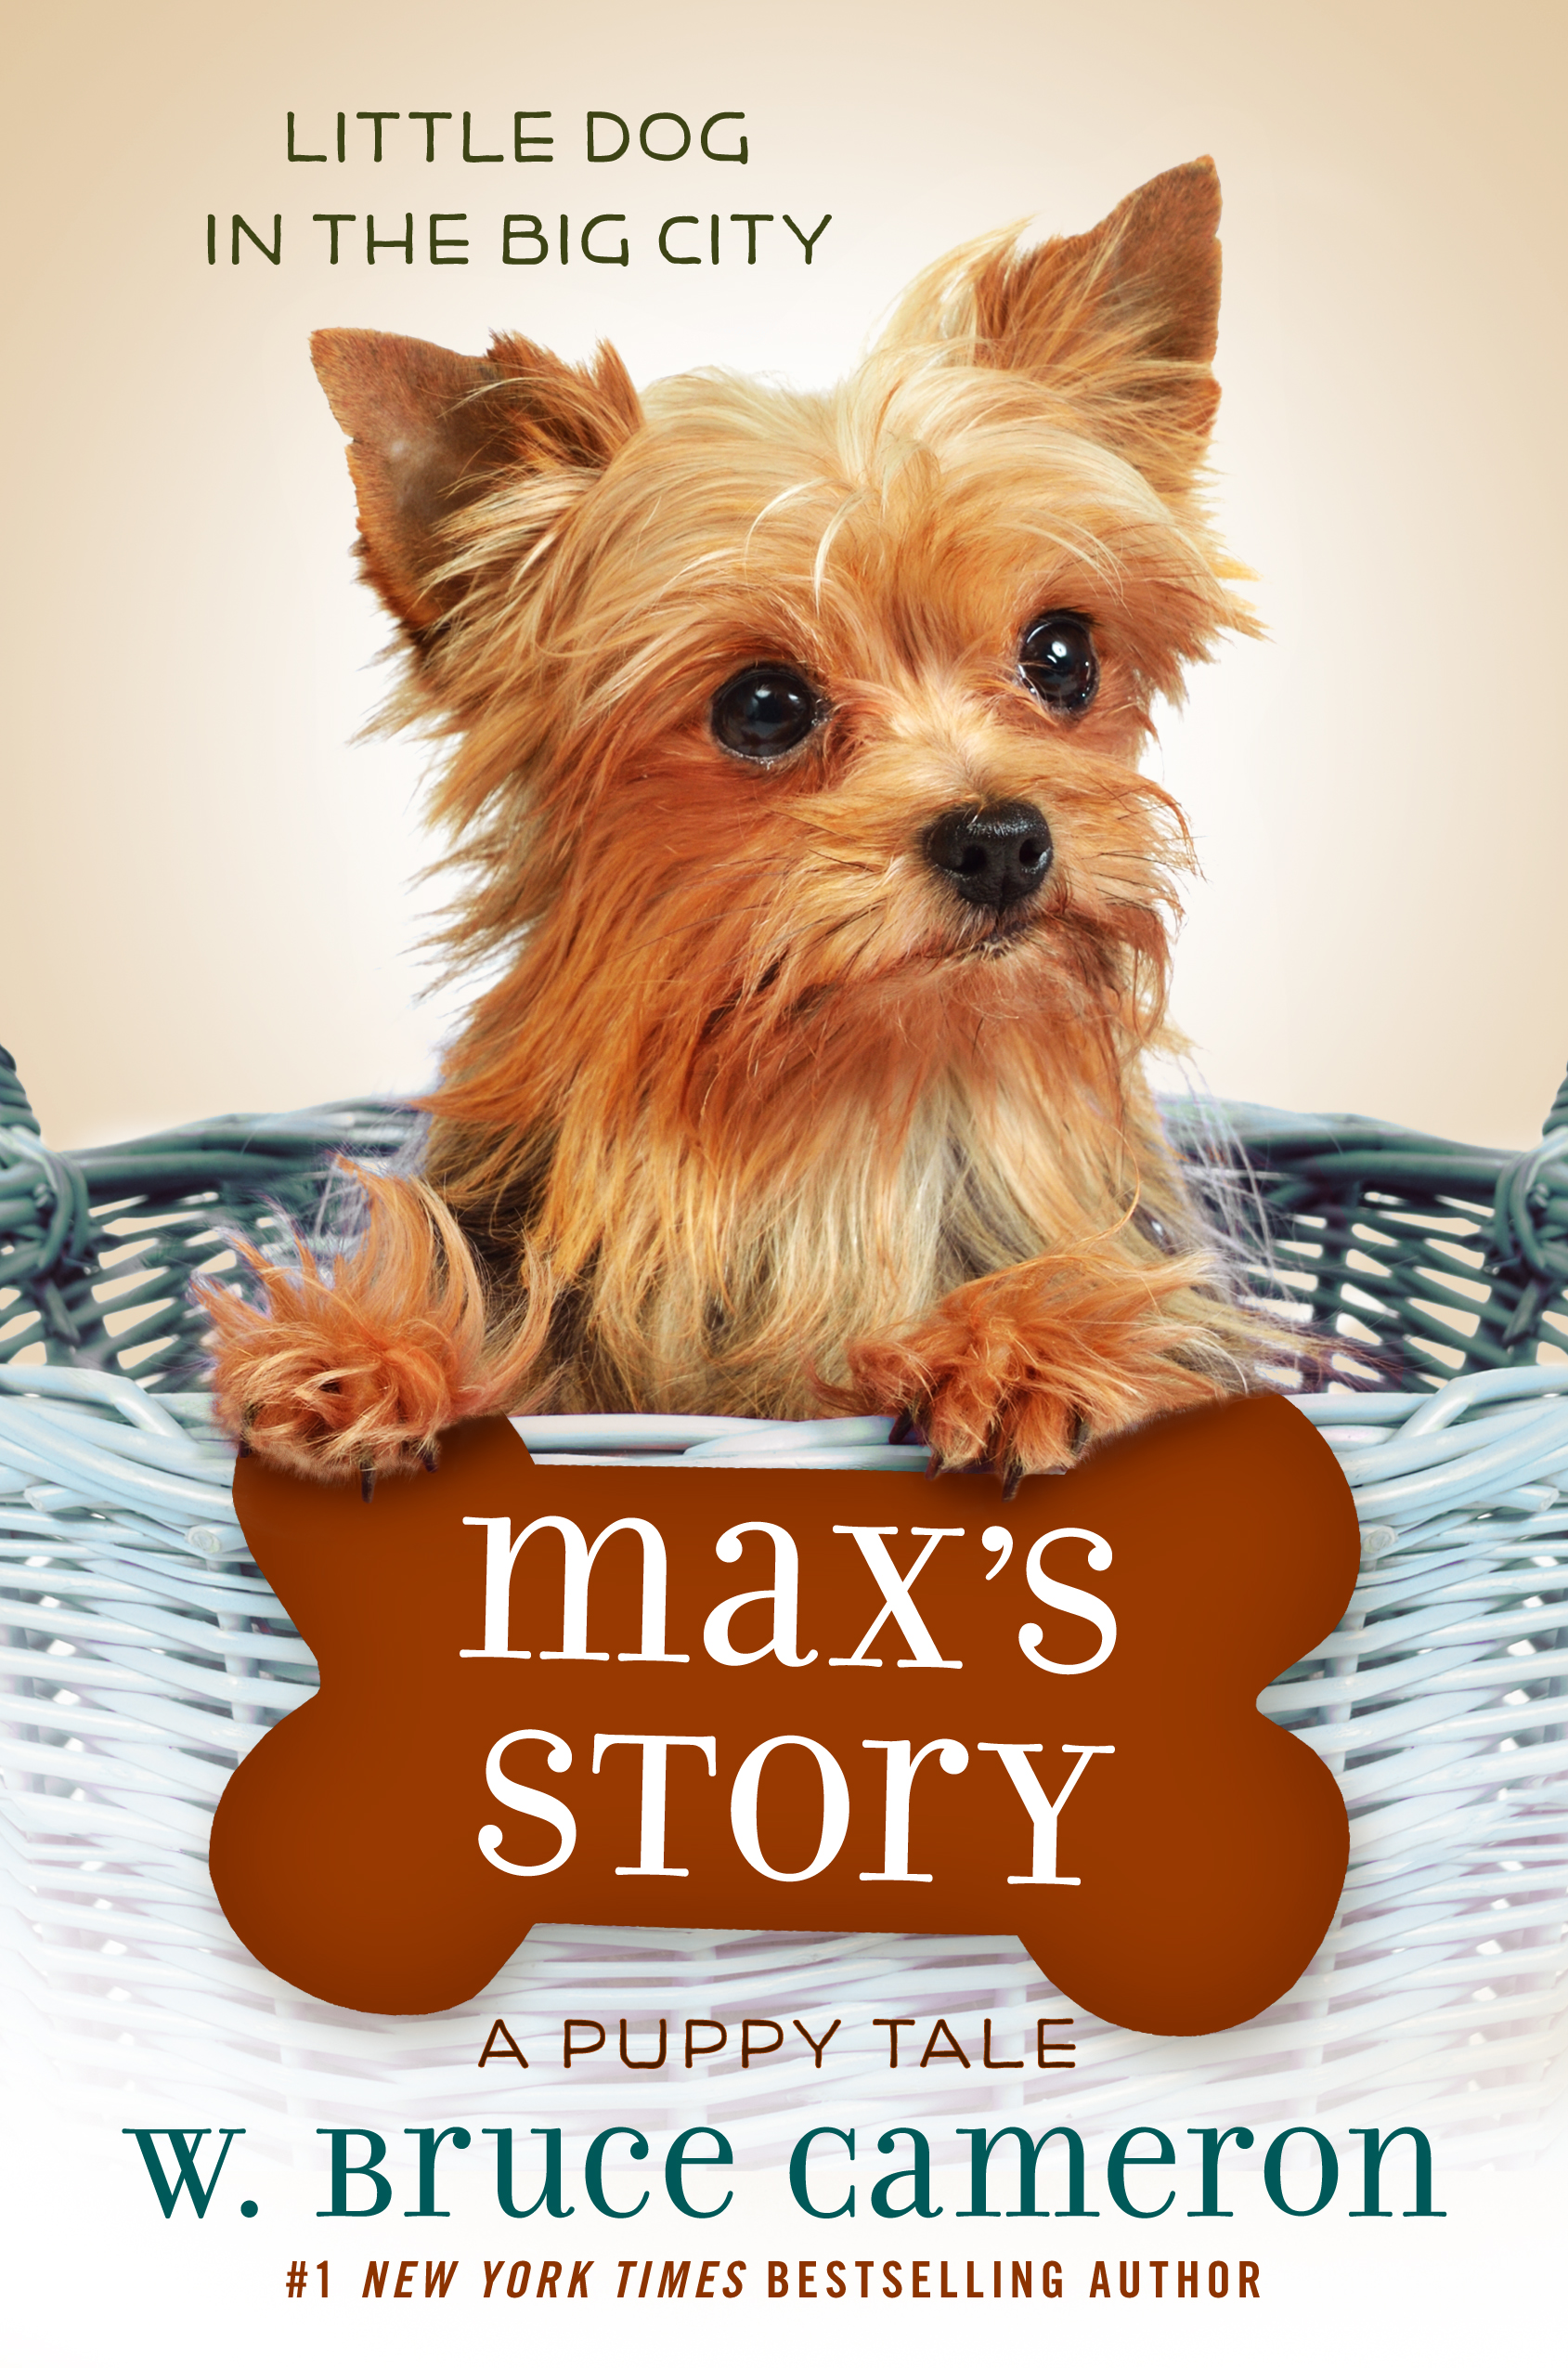 MaxsStory